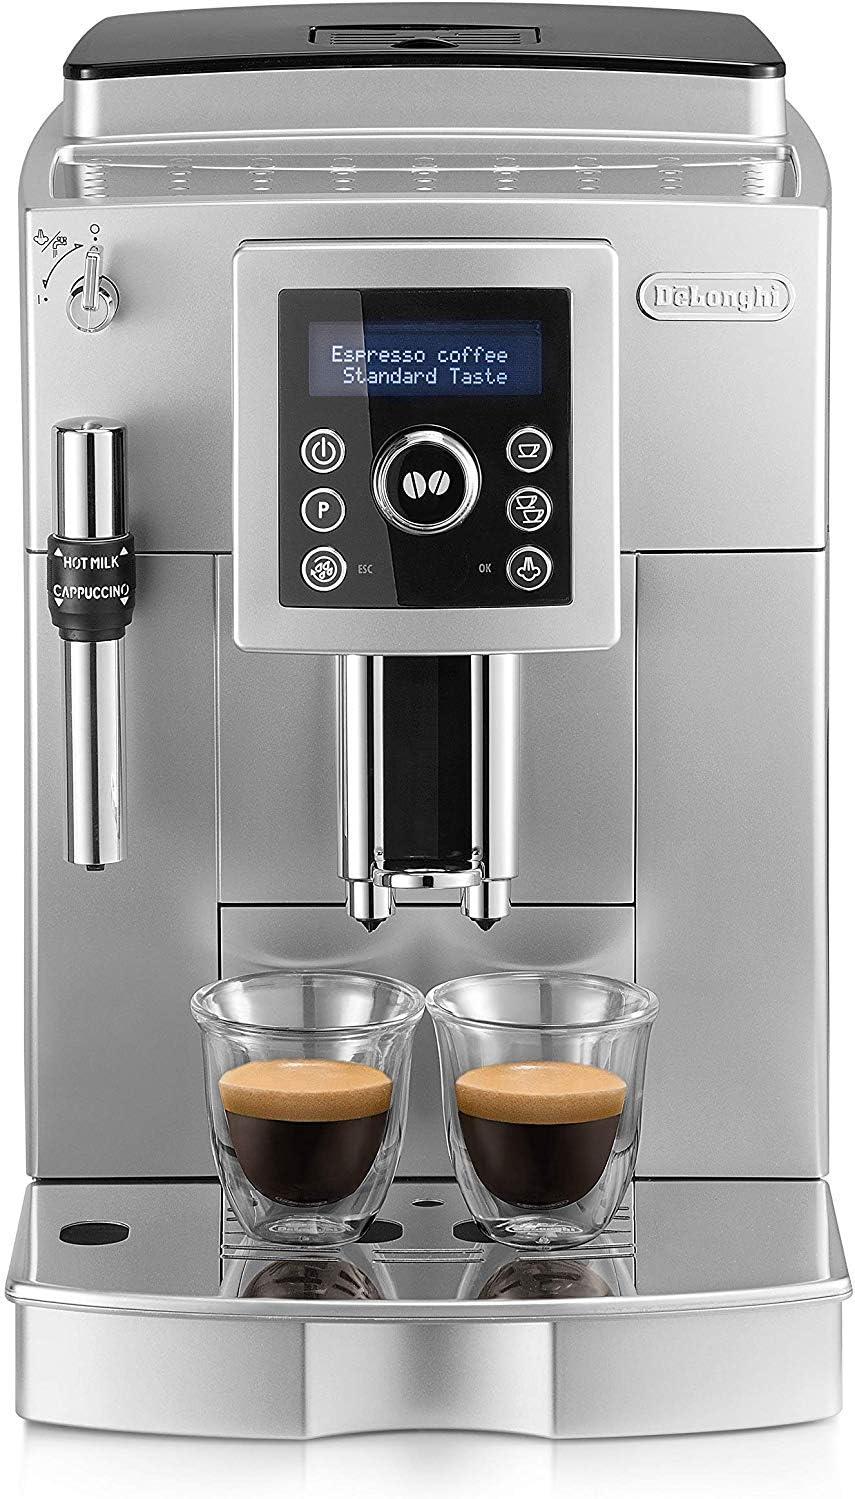 Delonghi Ecam 23.420.sb - Cafetera superautomática, 15 bares ...